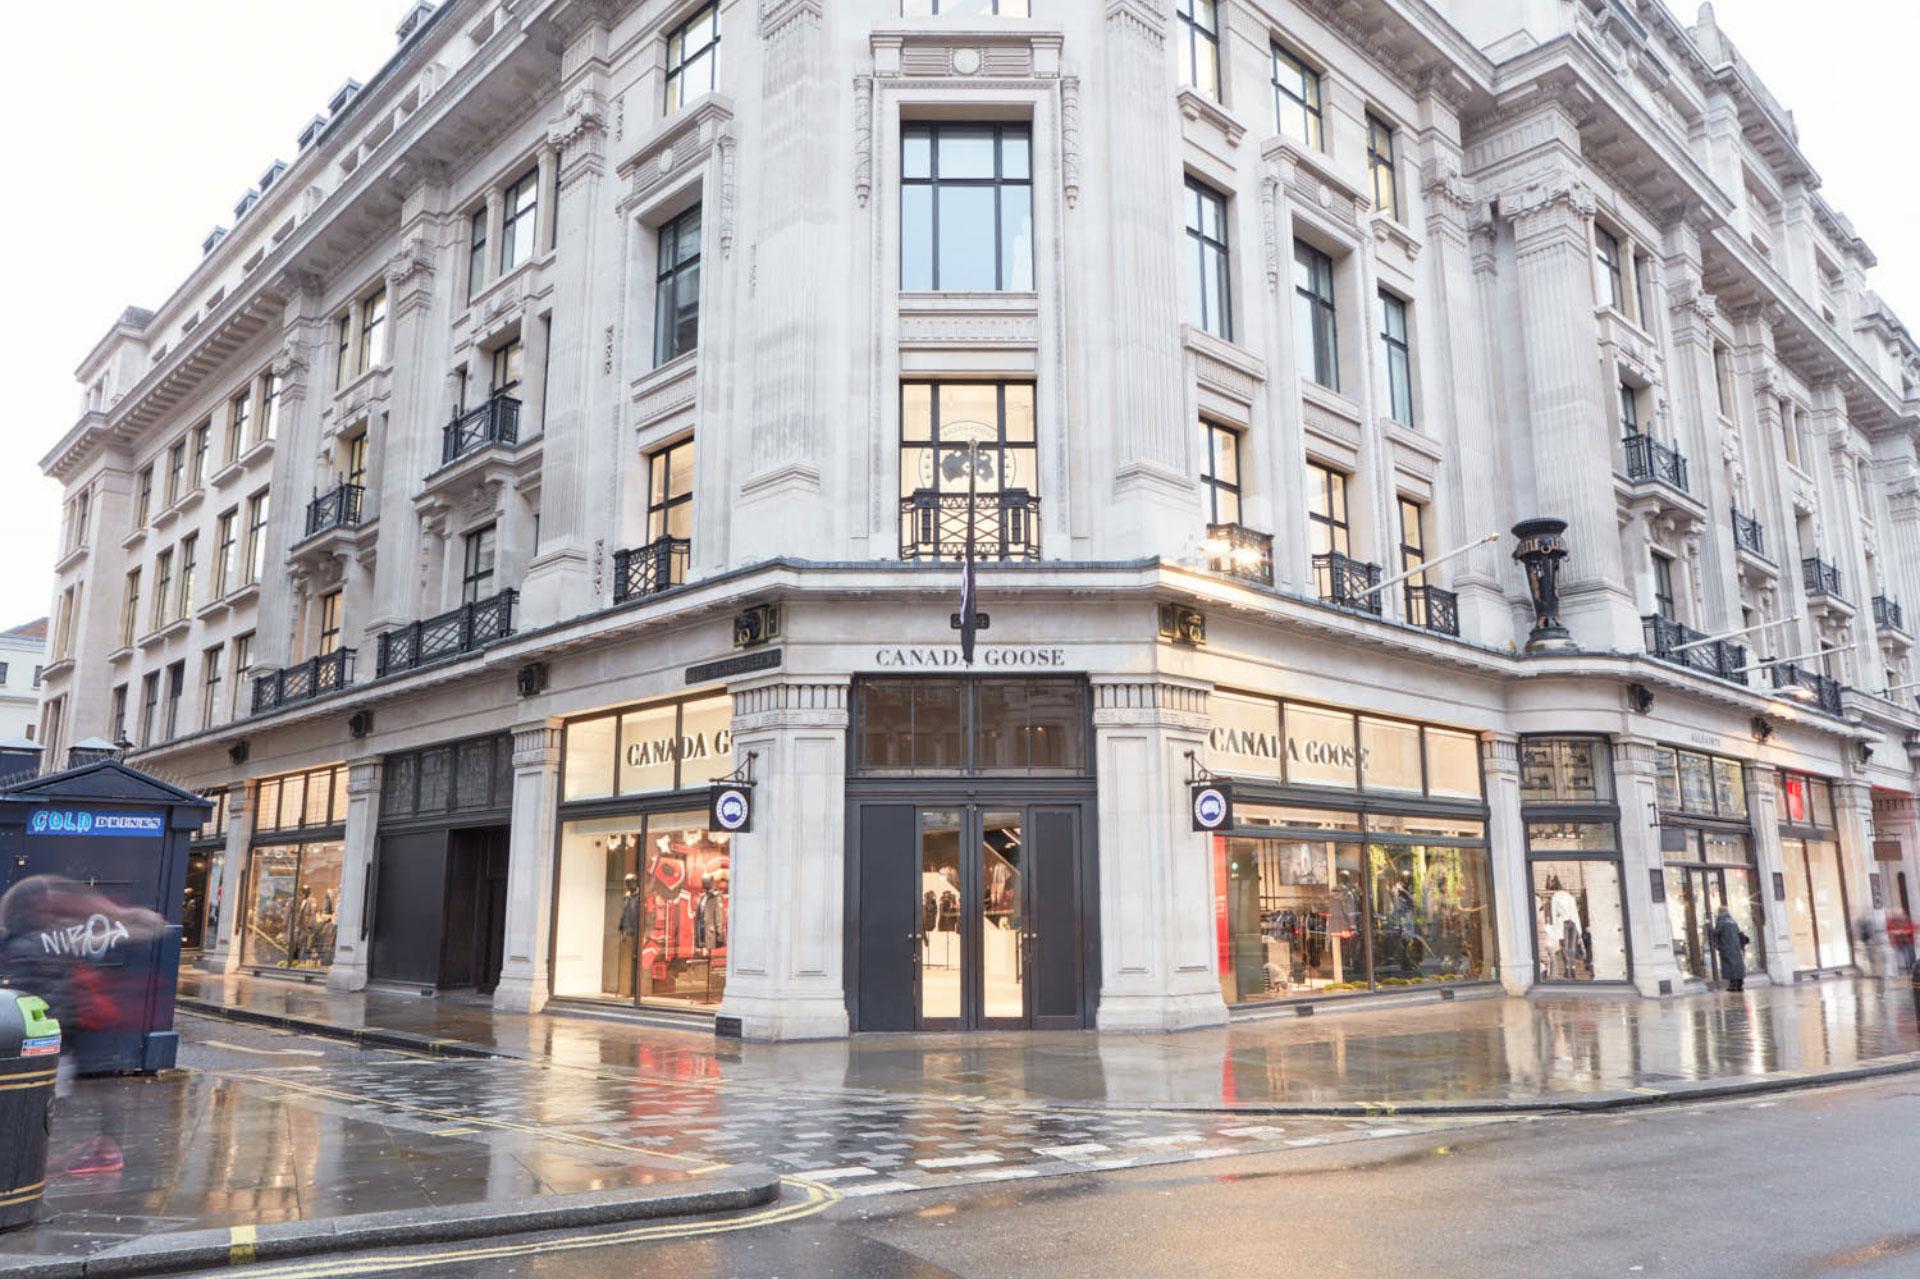 Canada Goose Flagship Store London Exterior